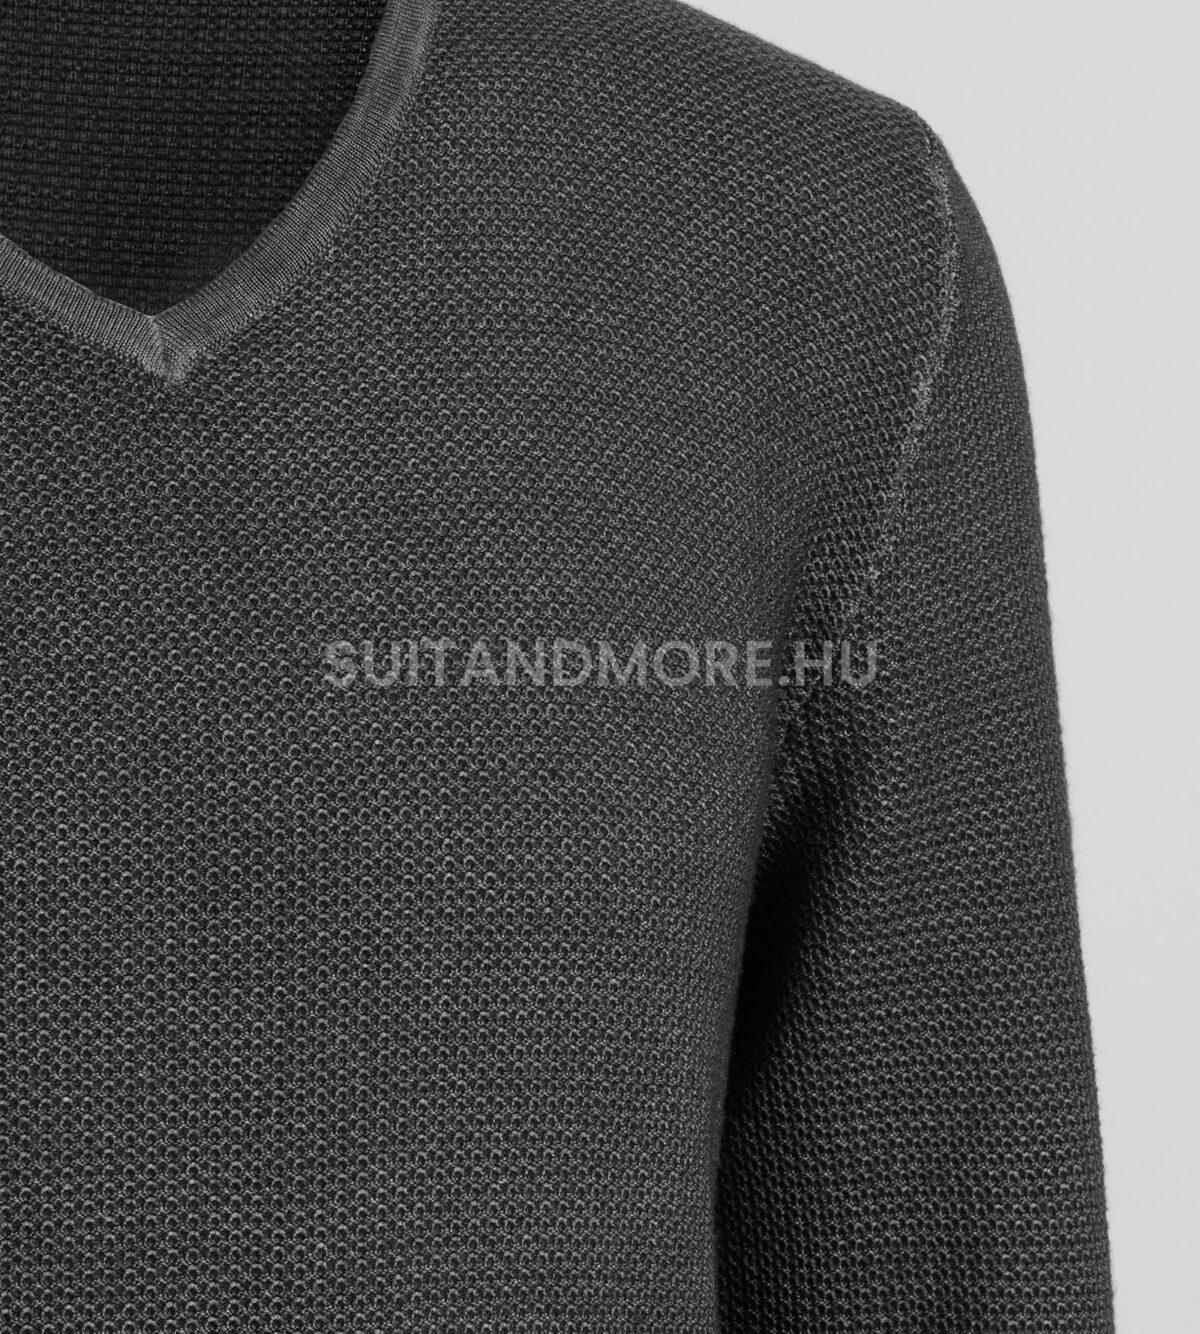 digel-sotetszurke-modern-fit-v-nyaku-gyapju-pulover-fabrizio1-1-1288003-42-02